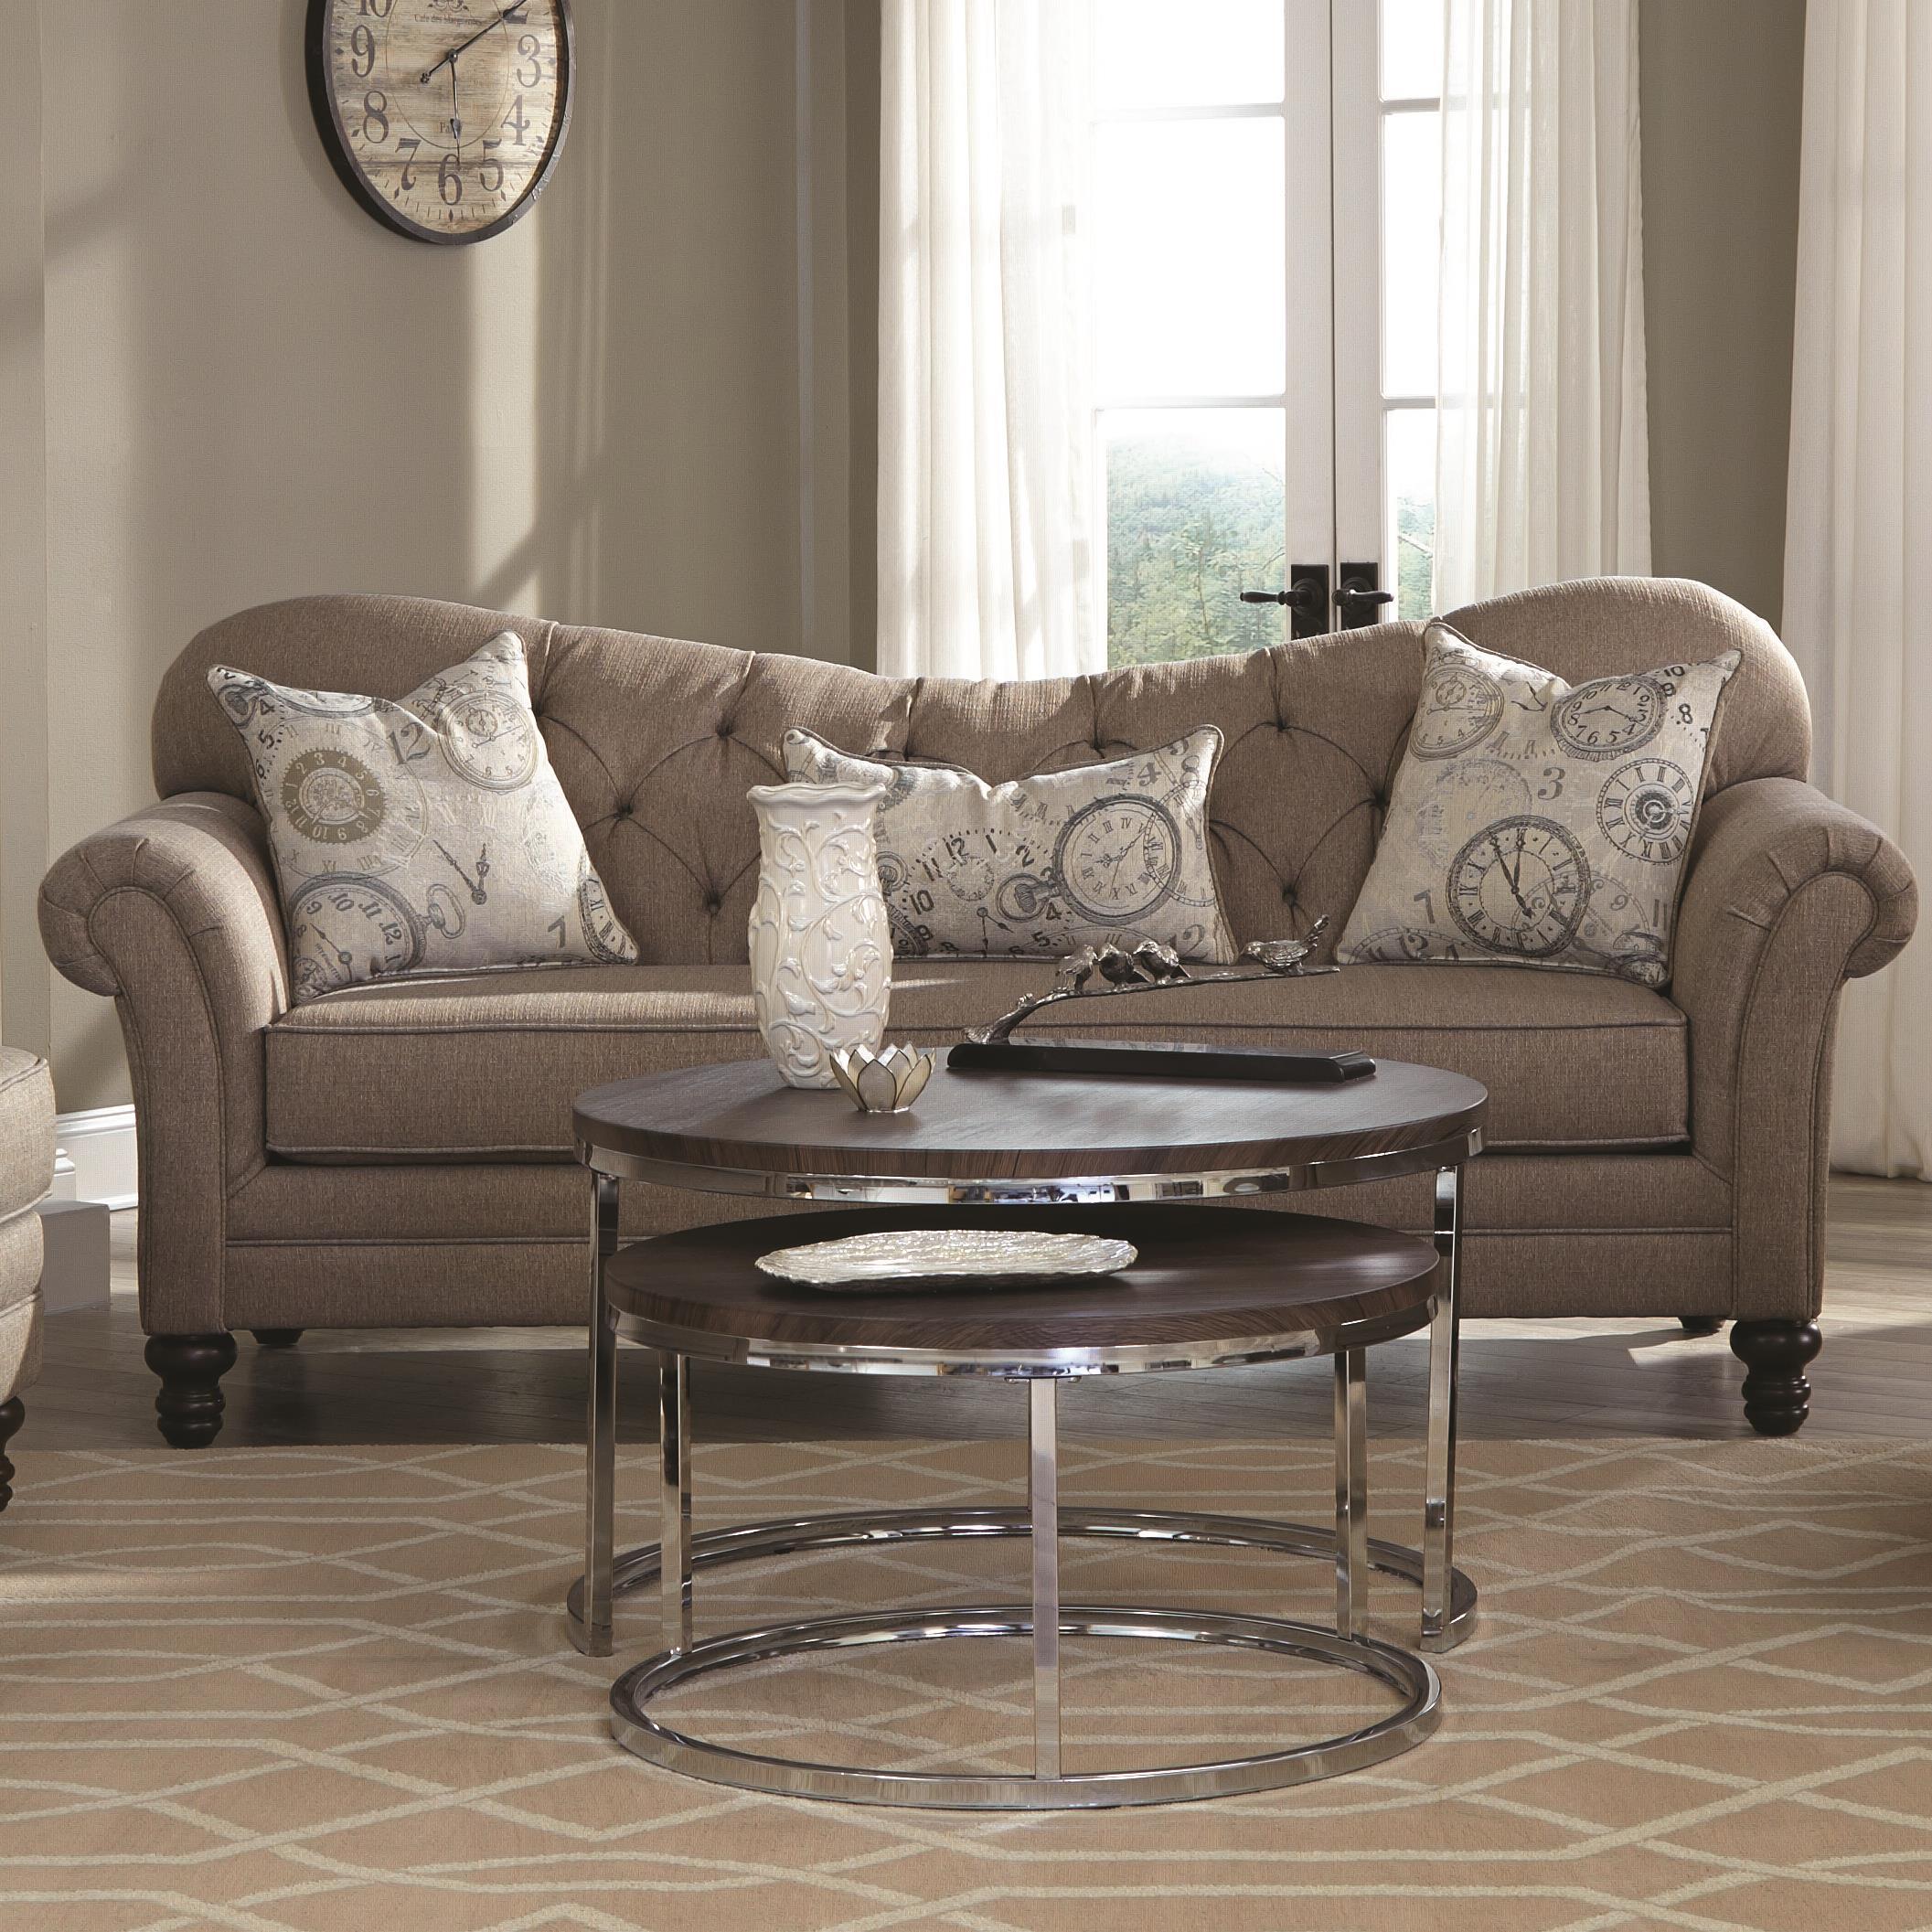 camel tufted sofa chaise fundas para sofas baratas barcelona coaster carnahan 505251 traditional with